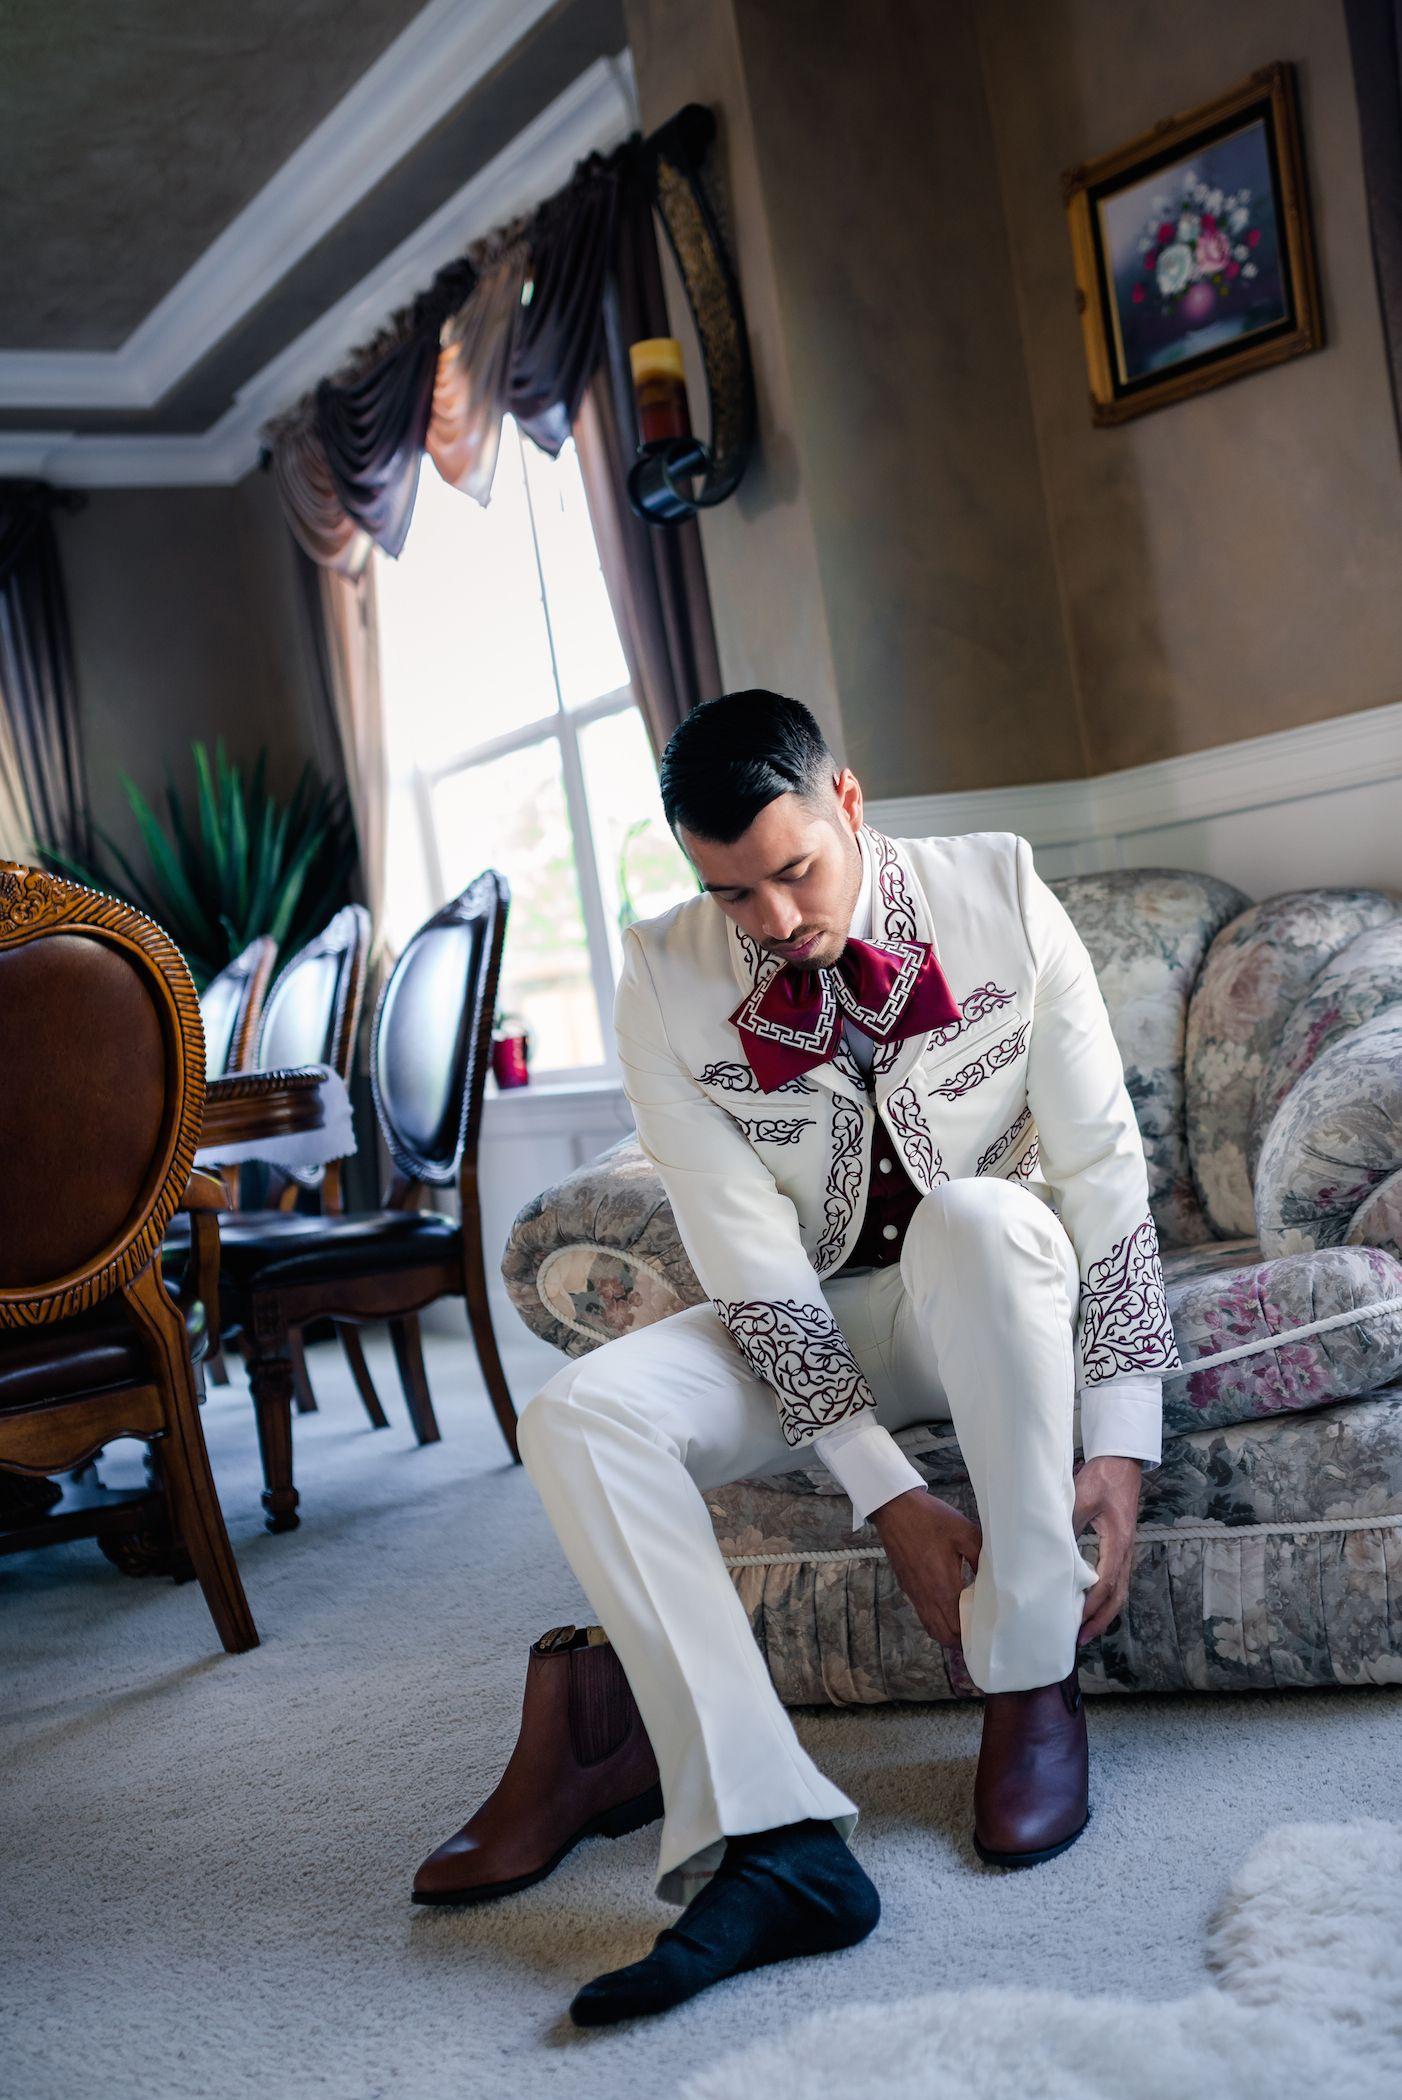 Groom almost ready #weddingparty #wedding #groom #charro #suit ...